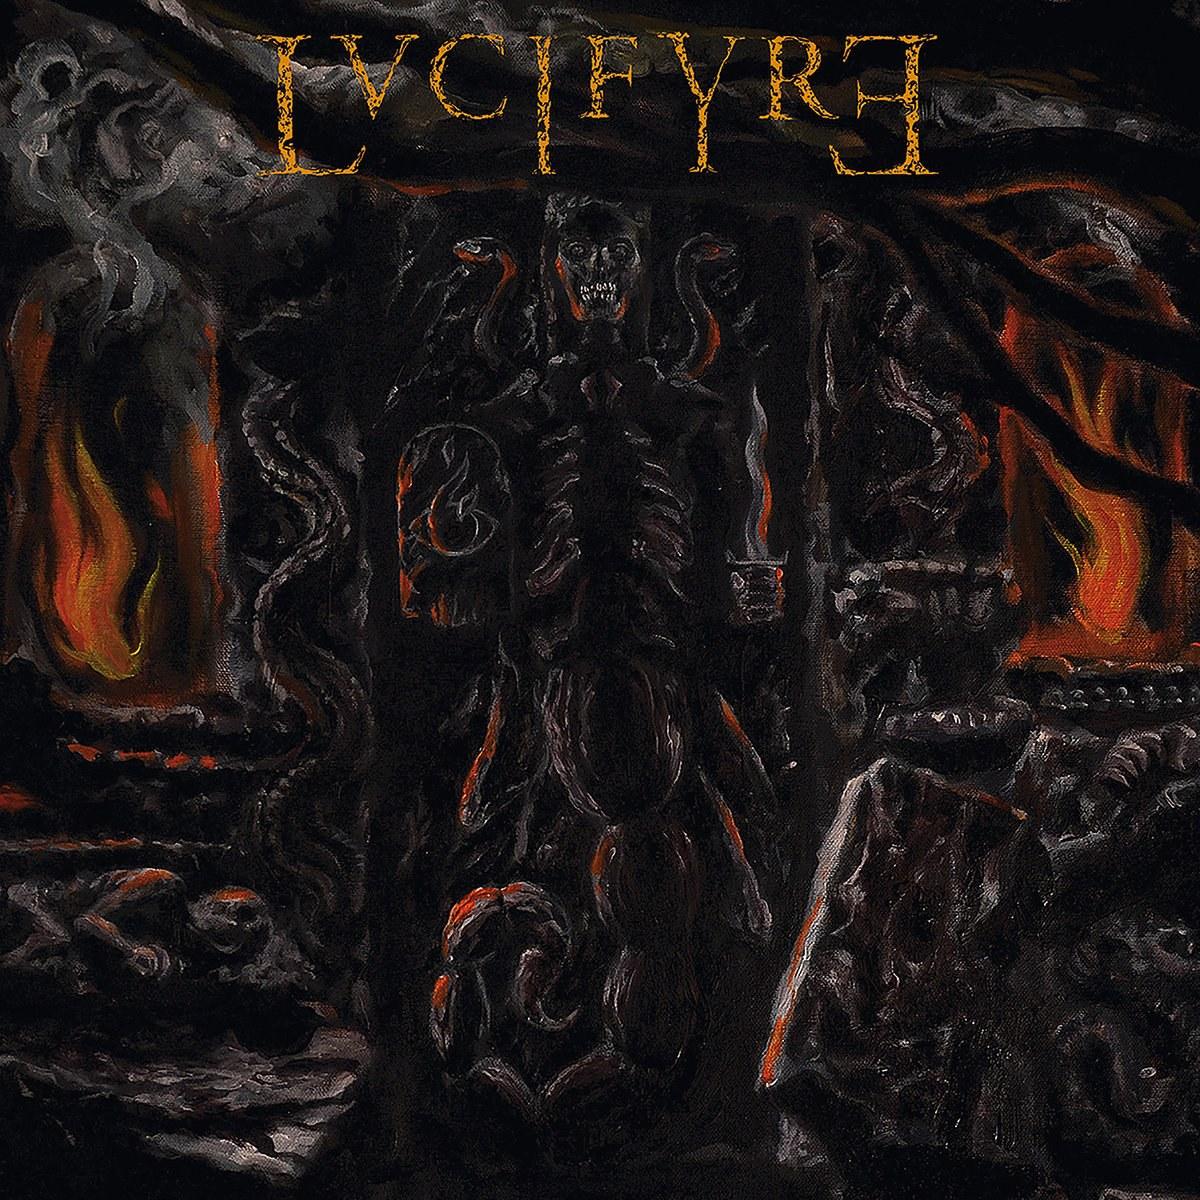 Reviews for Lvcifyre - Sacrament